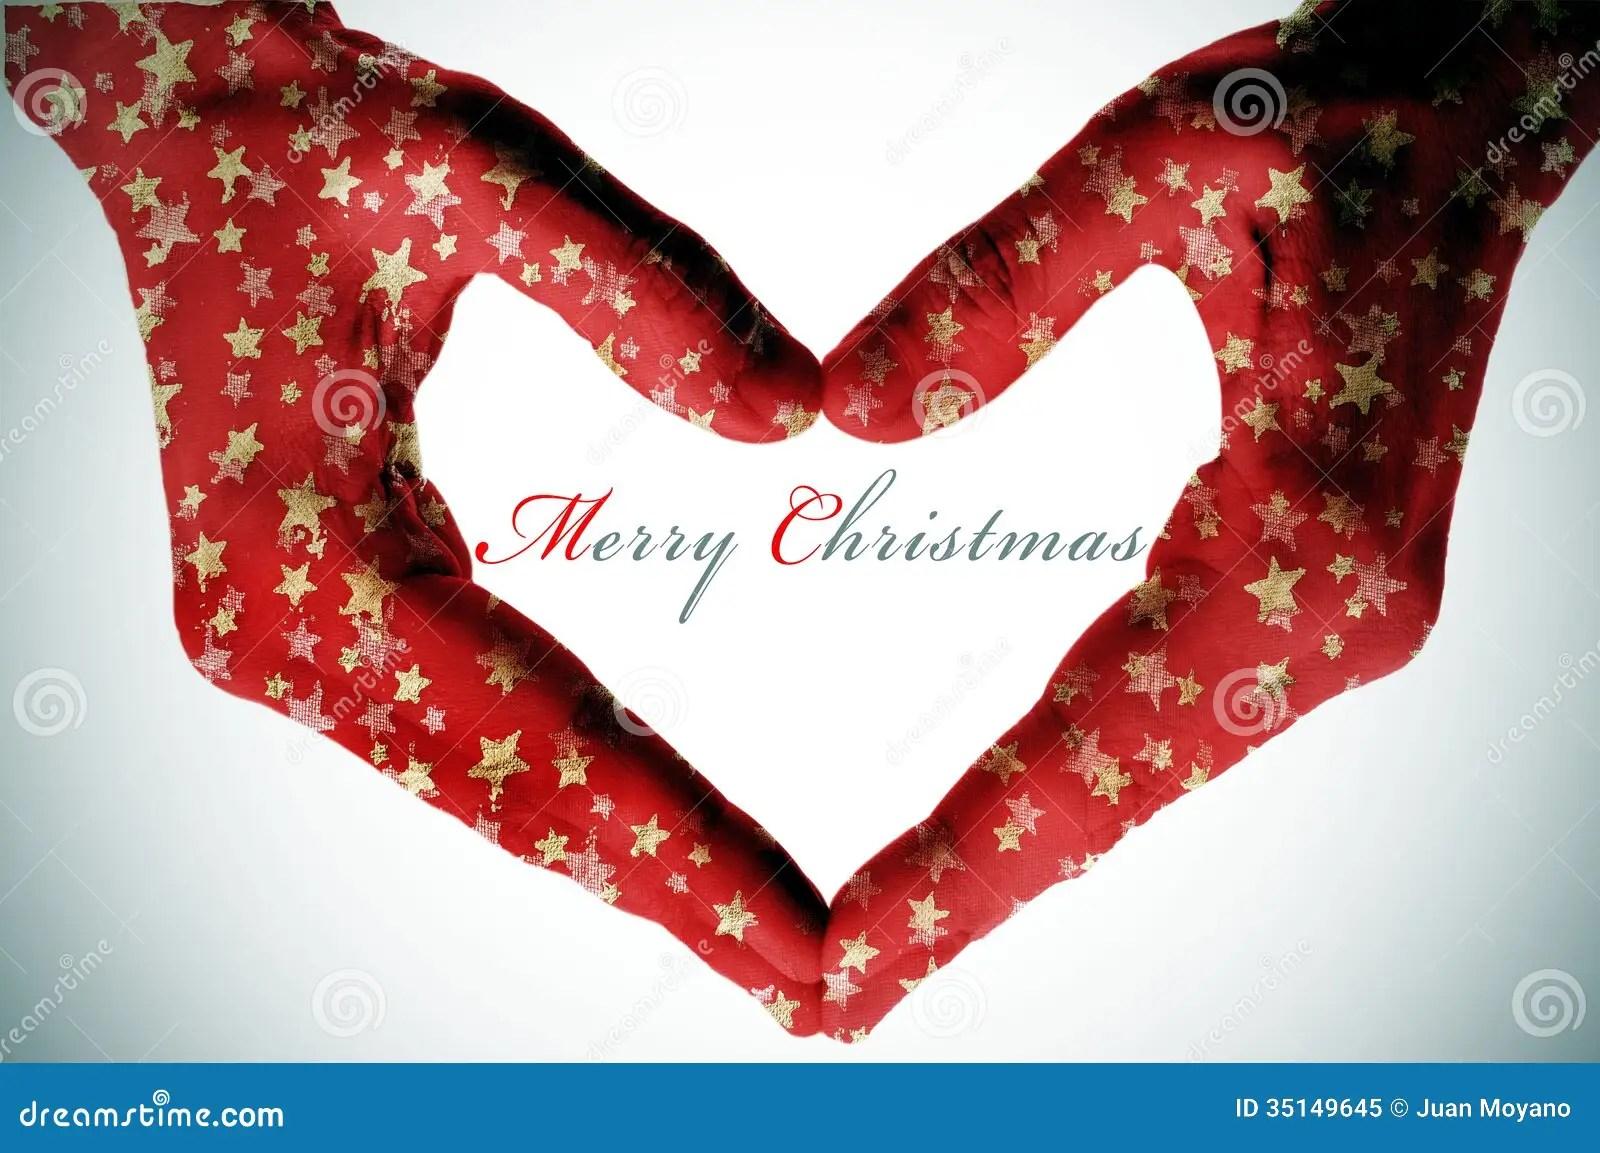 Merry Christmas Royalty Free Stock Photo  Image 35149645